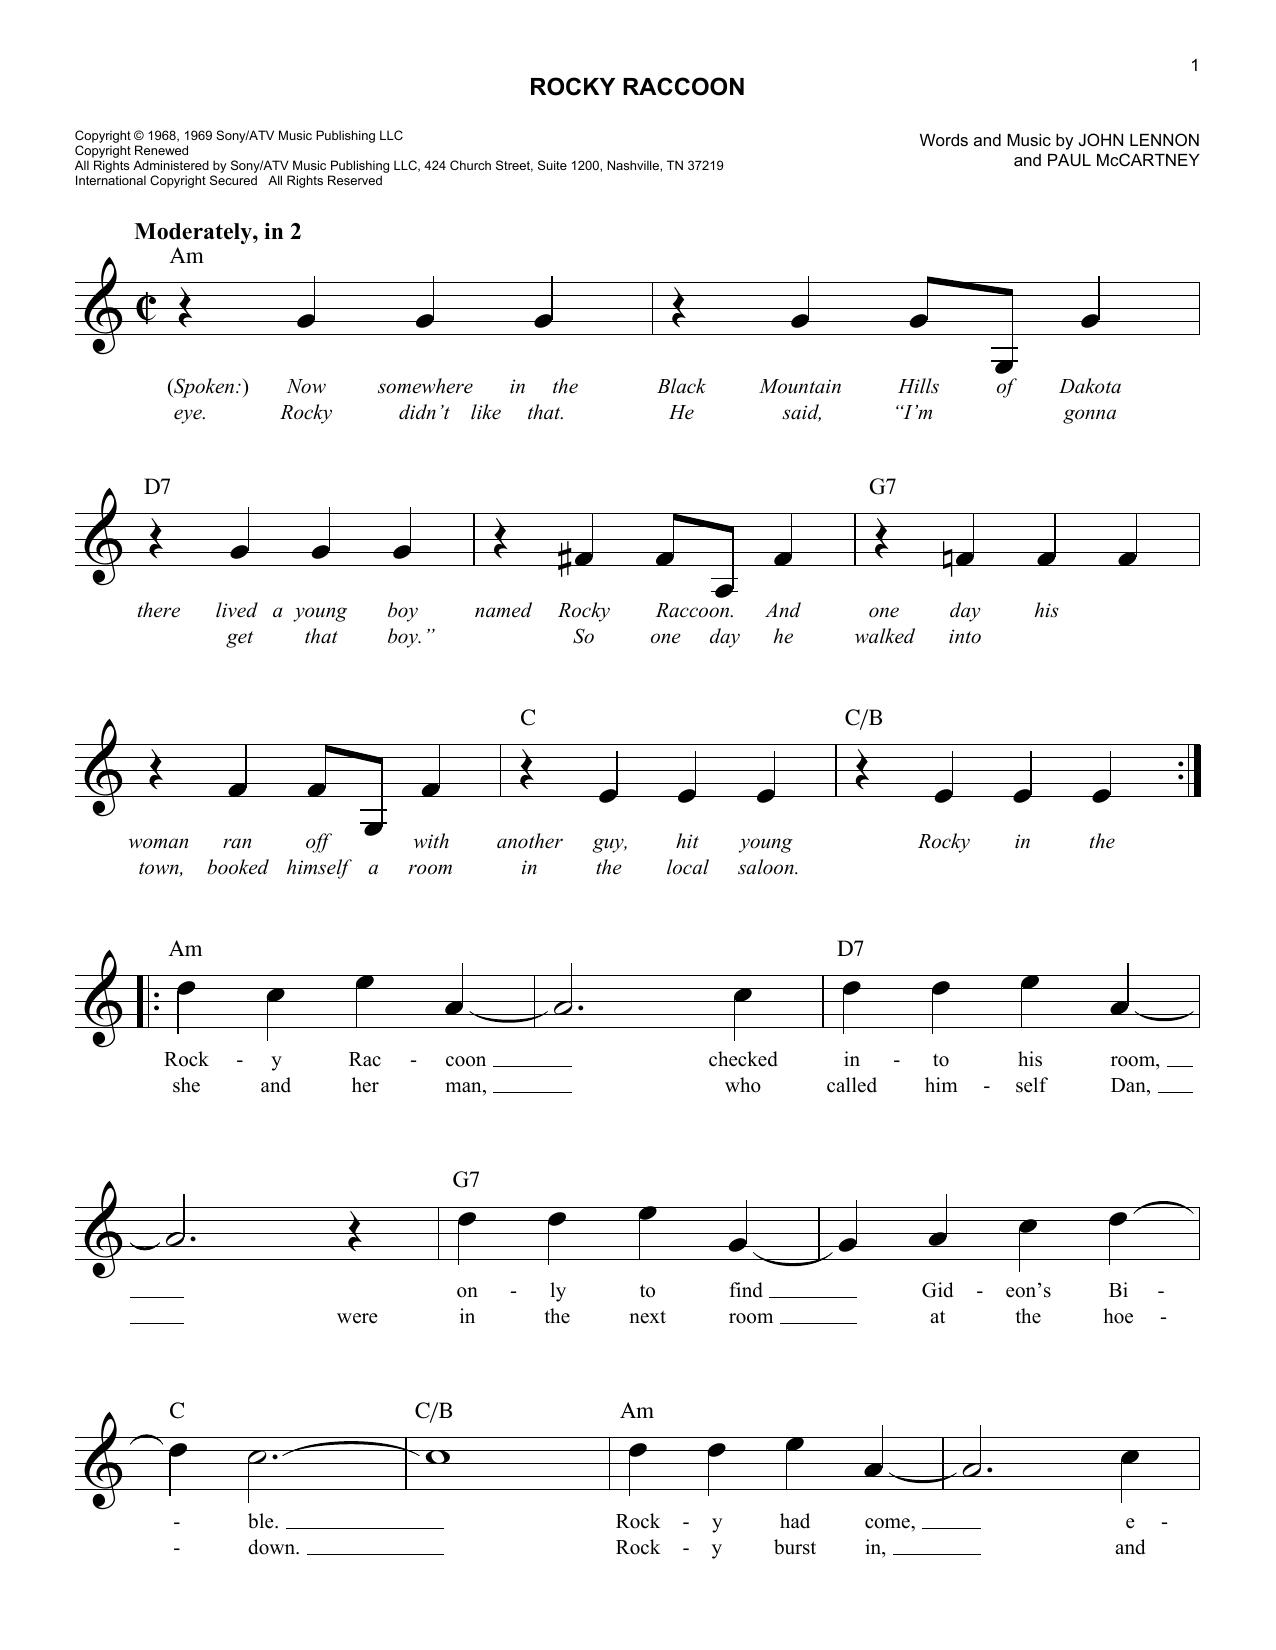 Rocky Raccoon Sheet Music The Beatles Melody Line Lyrics Chords